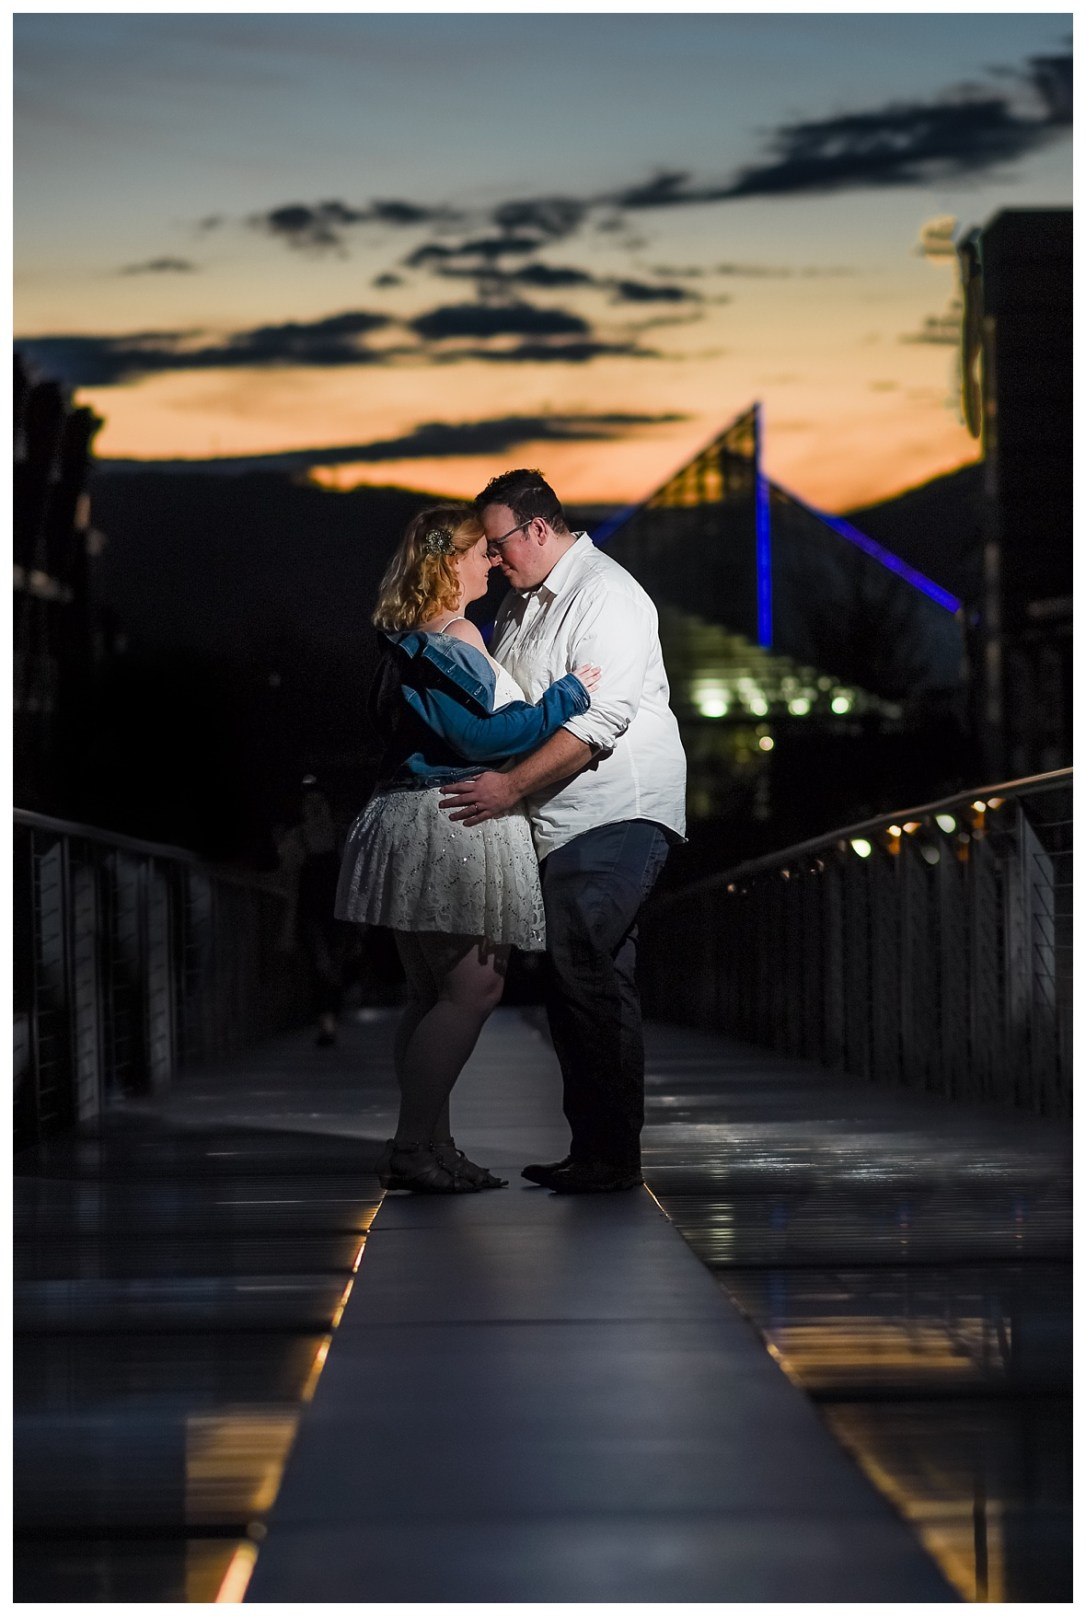 nightime engagement photos